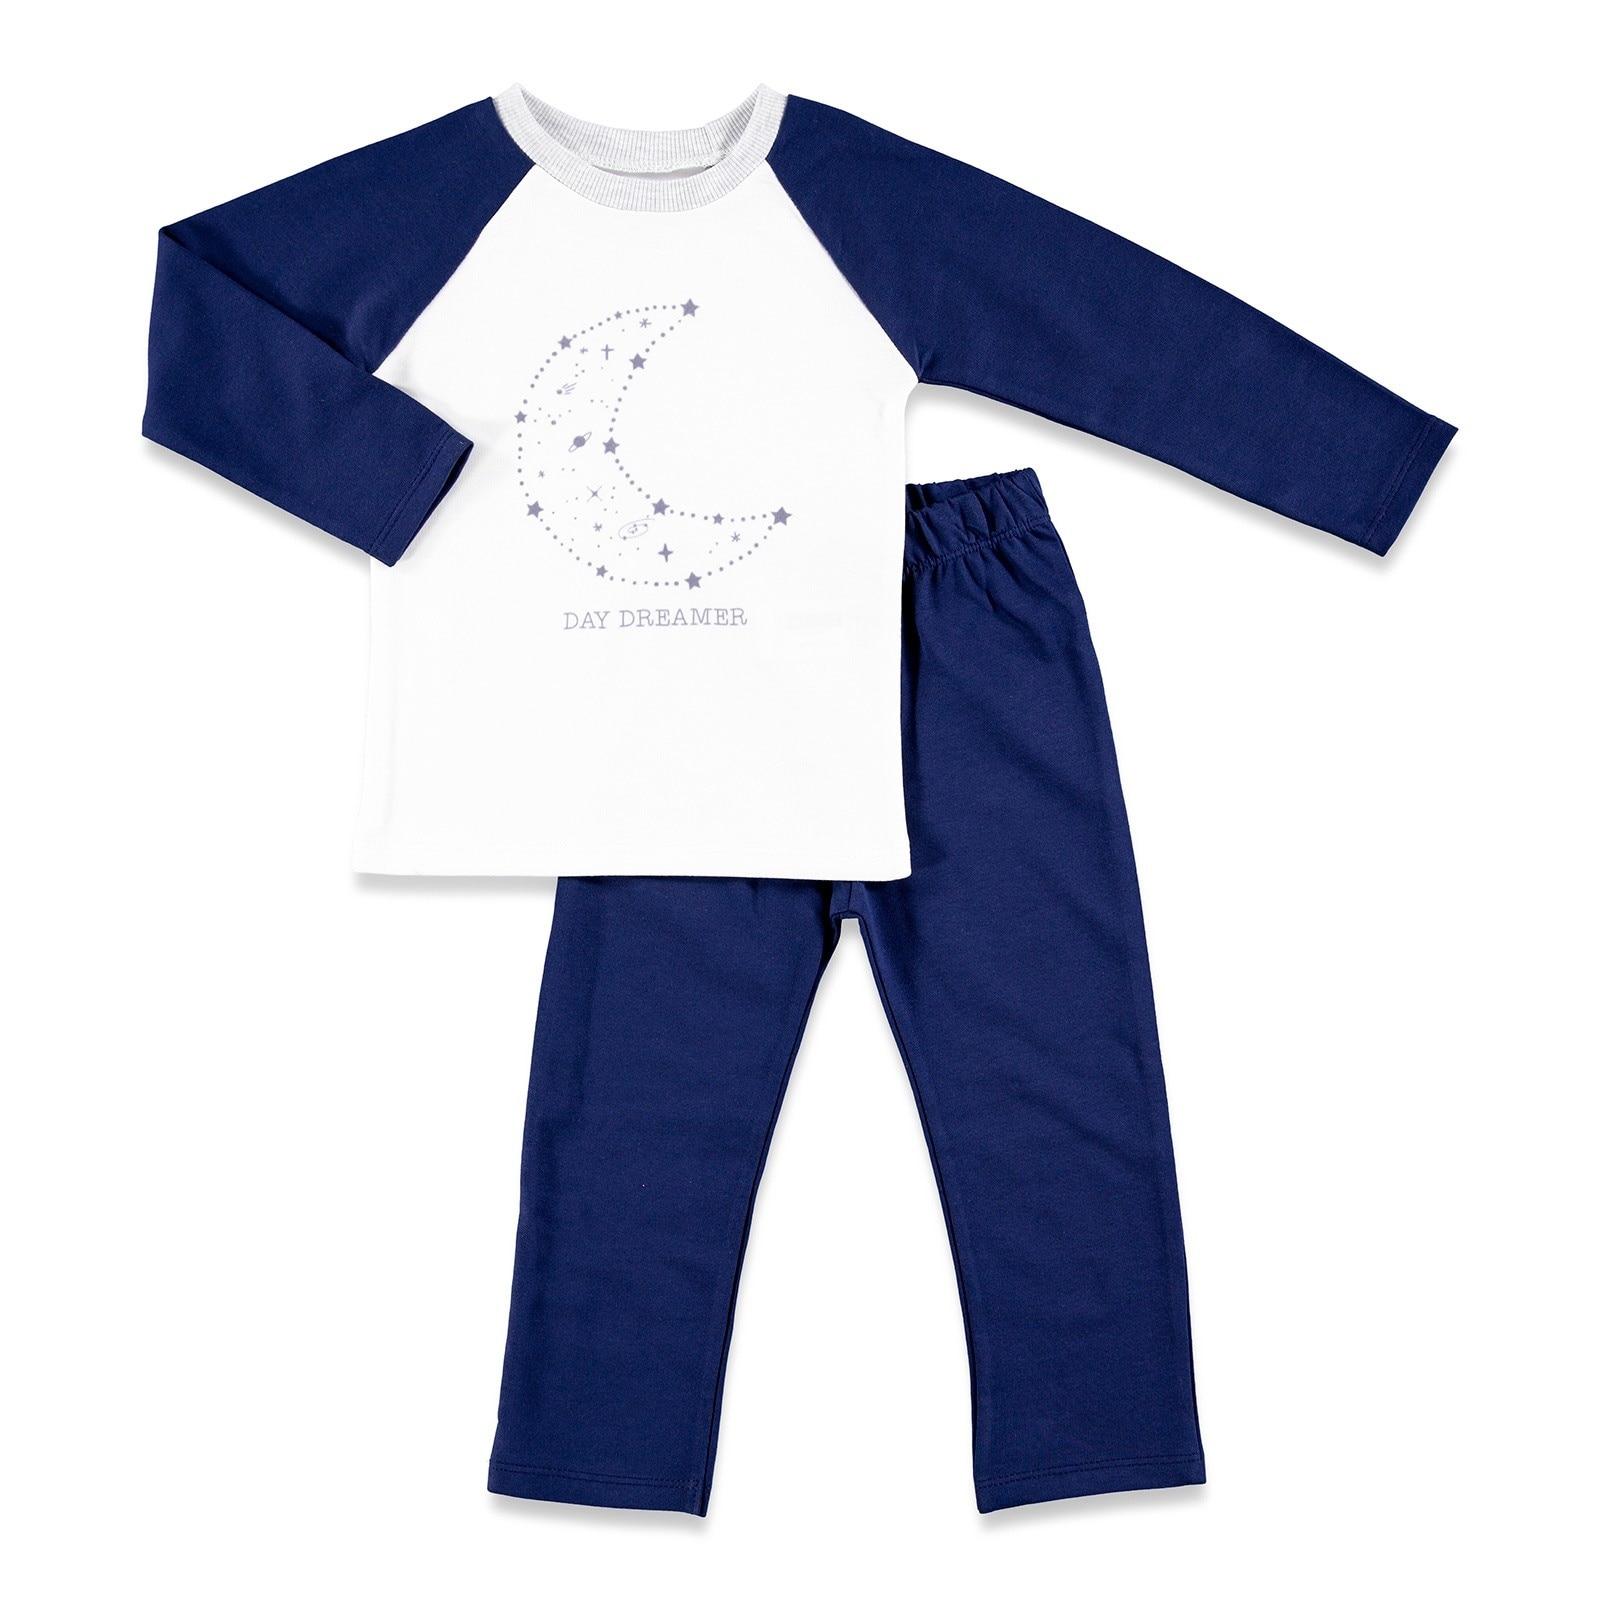 Ebebek Newborn Fashion Club Polar Adventure Baby Sweatshirt Set